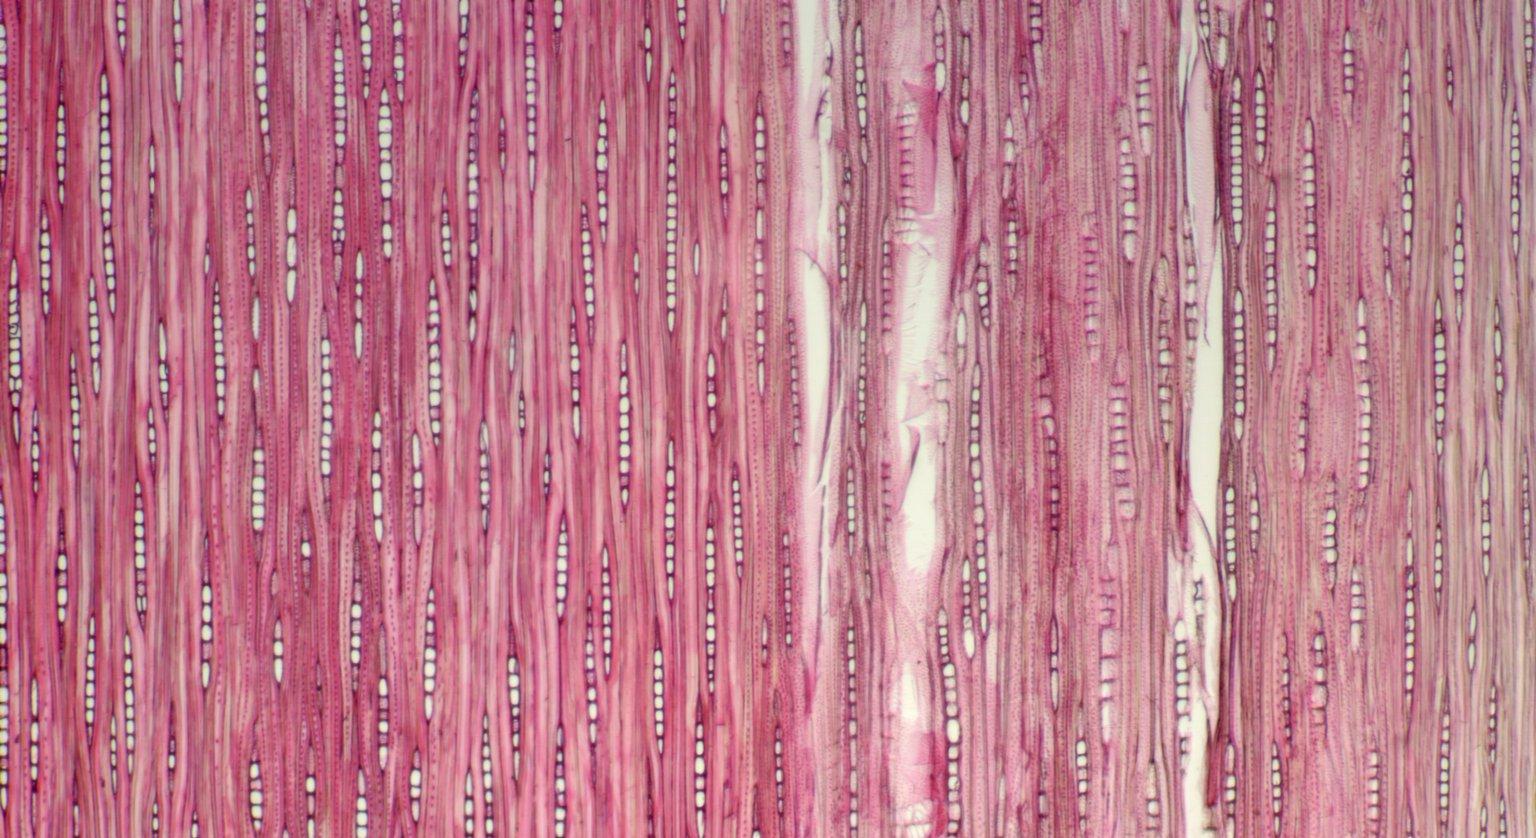 CALOPHYLLACEAE Calophyllum inophylliodes